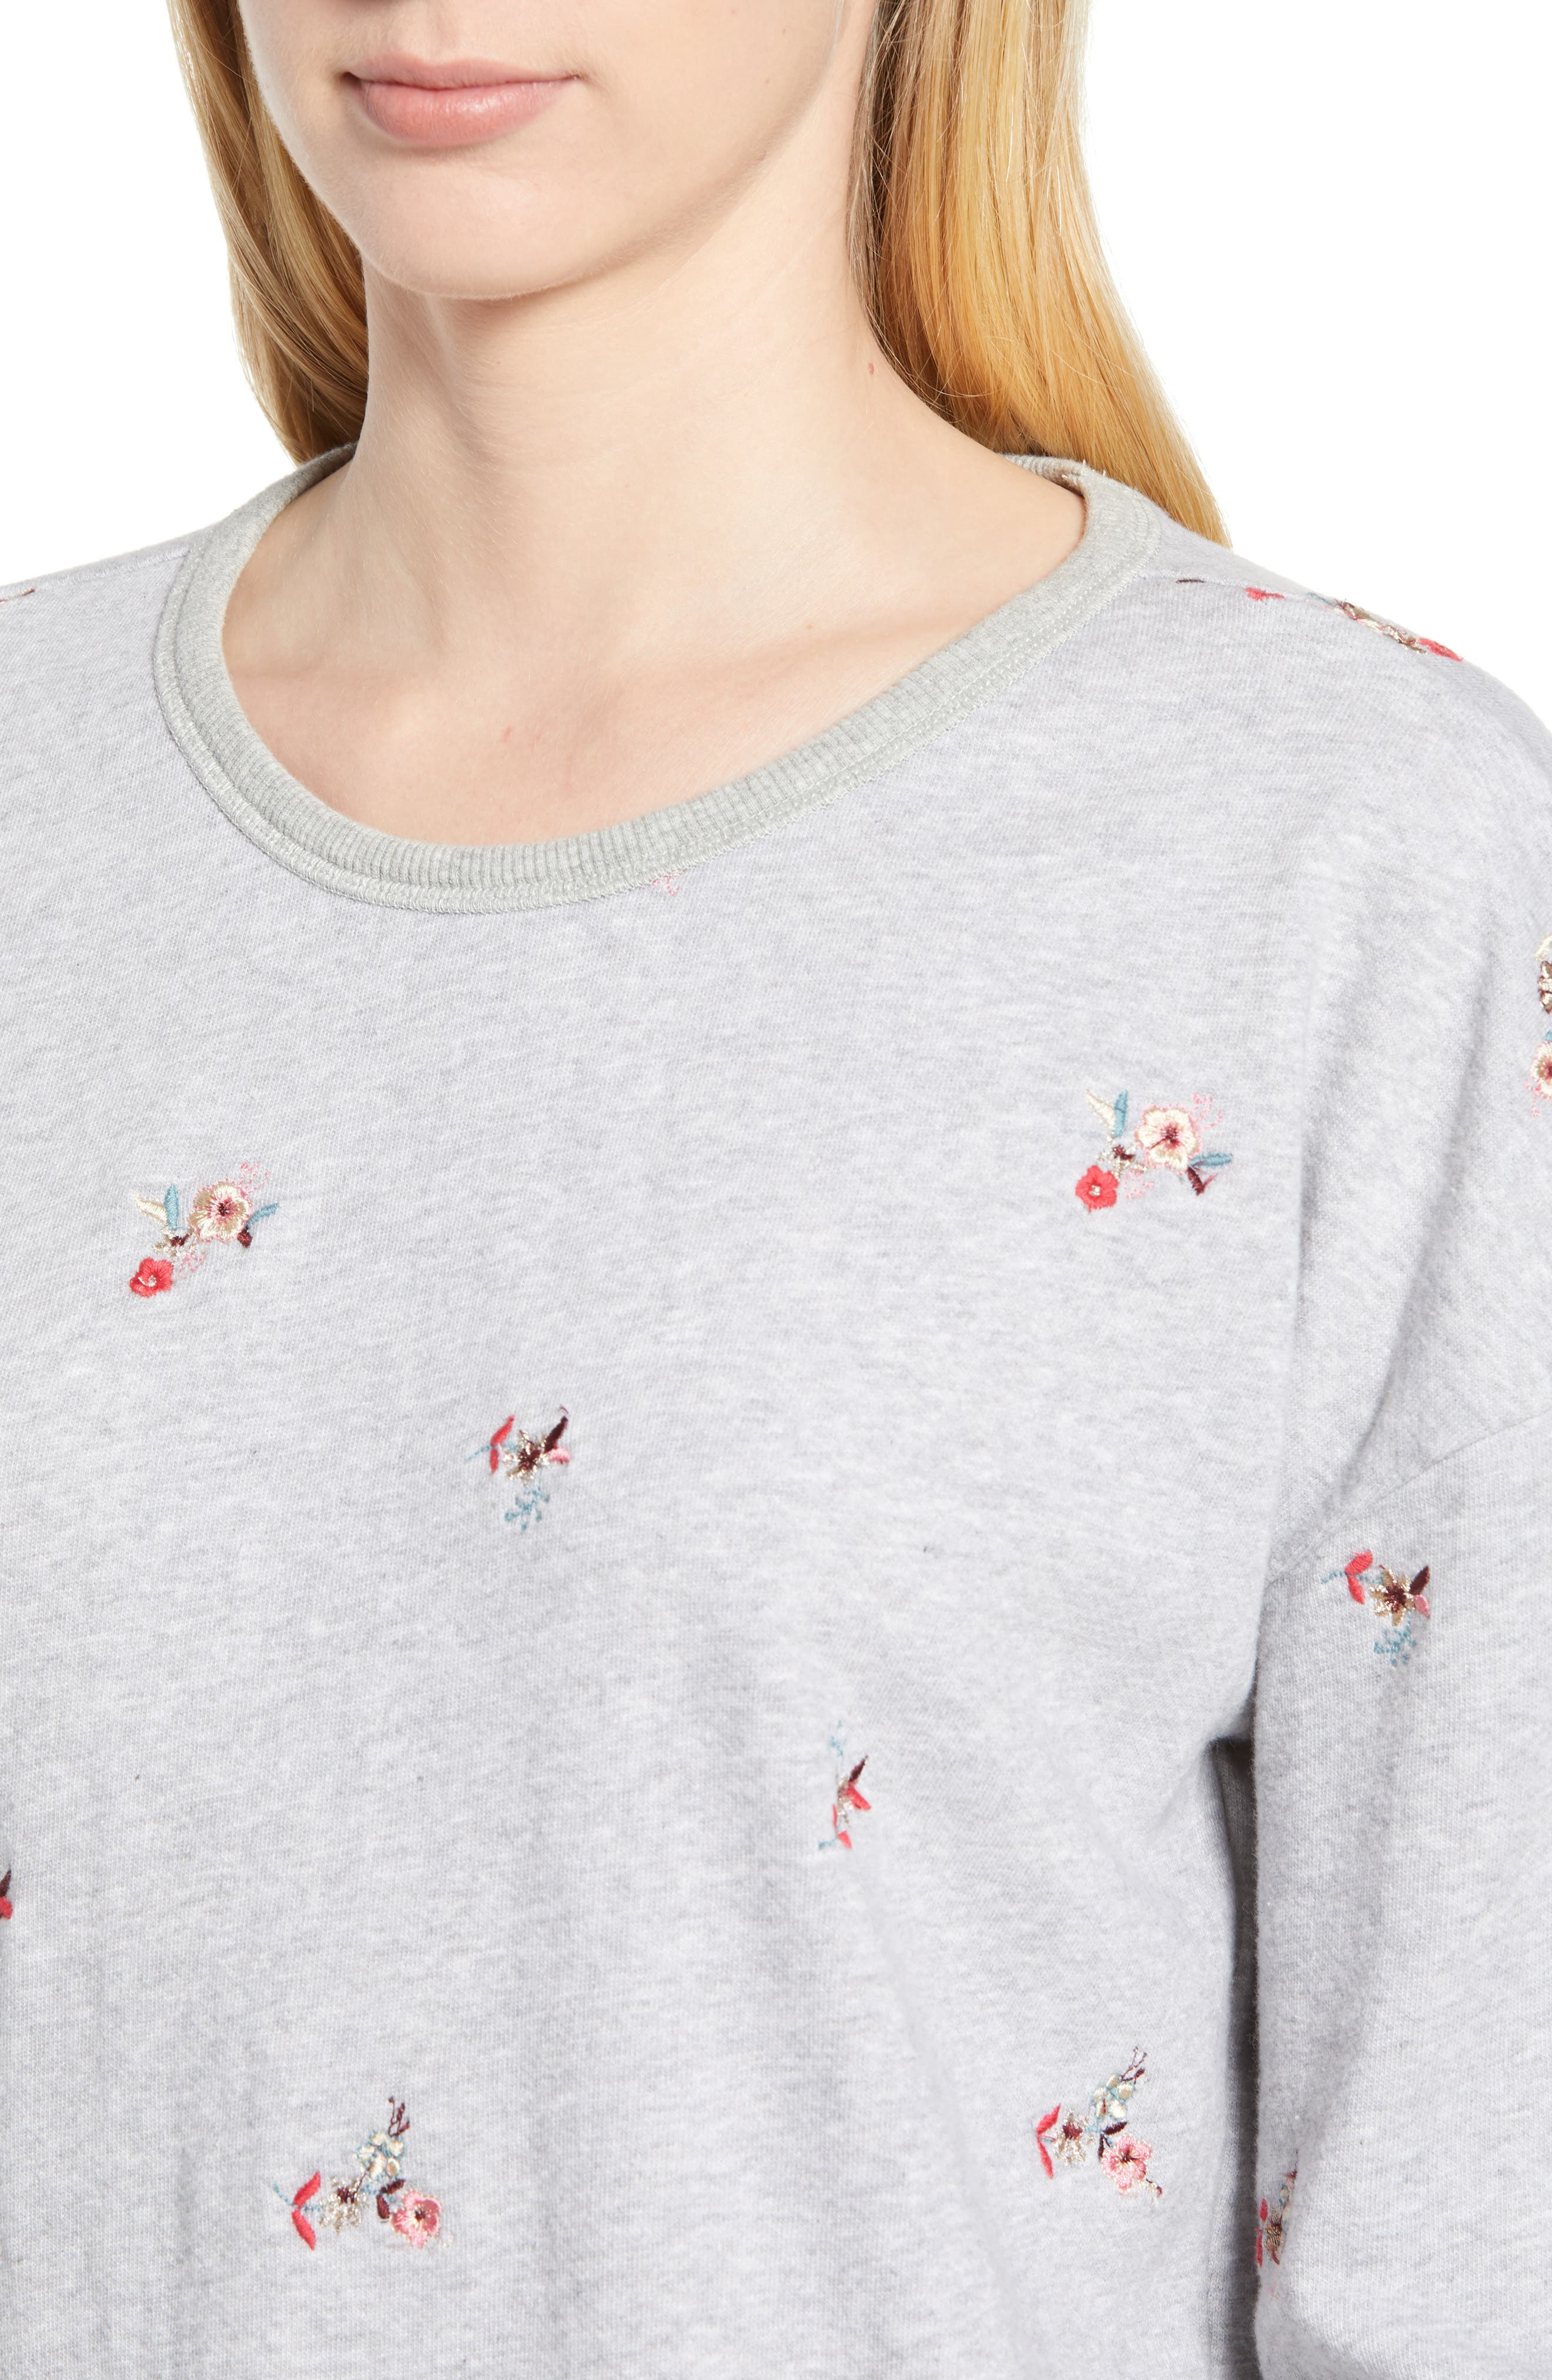 Embroidered Flowers Sweatshirt,                             Alternate thumbnail 4, color,                             030